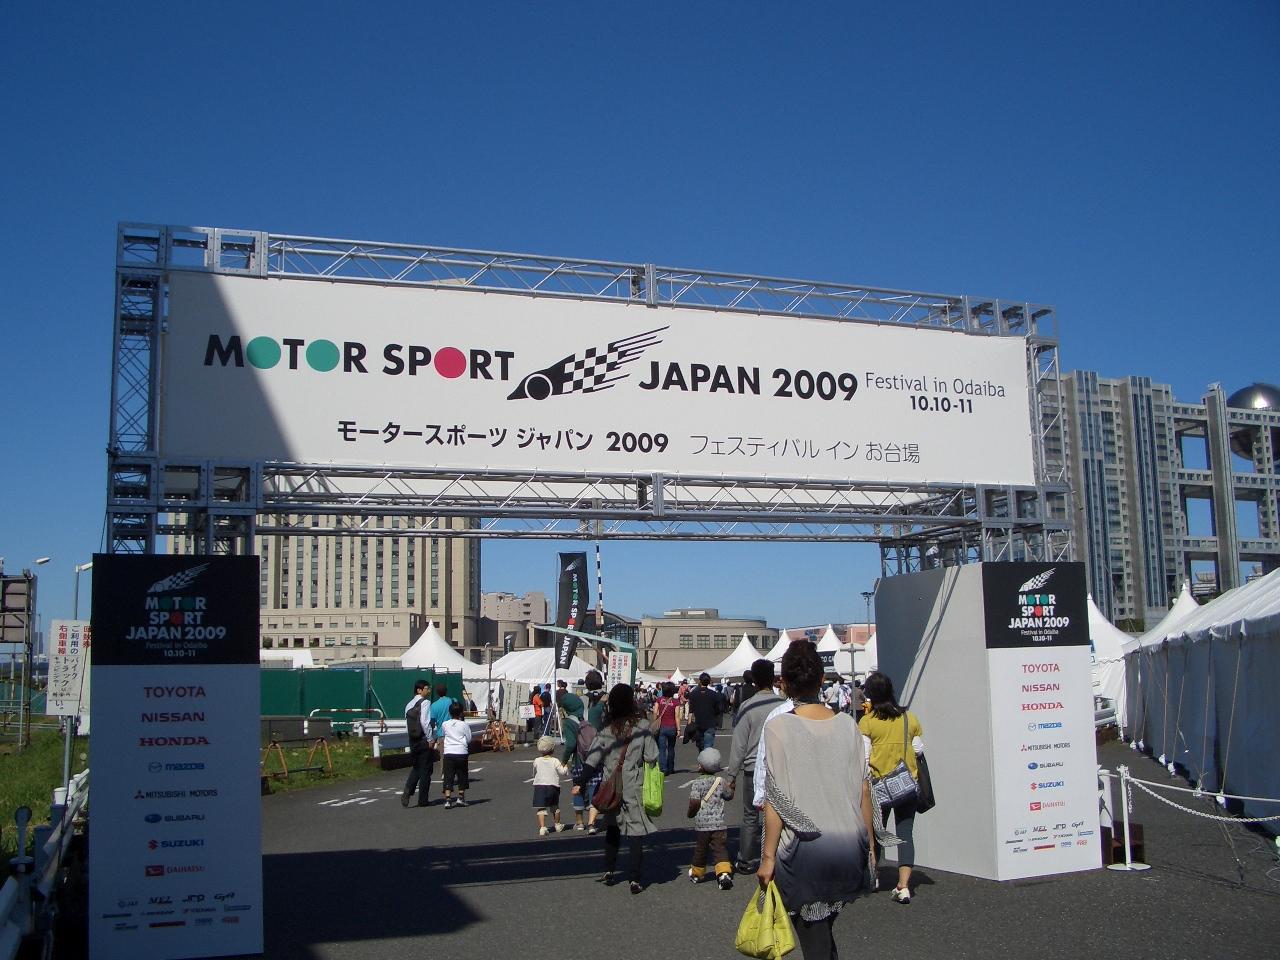 Motor sport JAPAN 2009